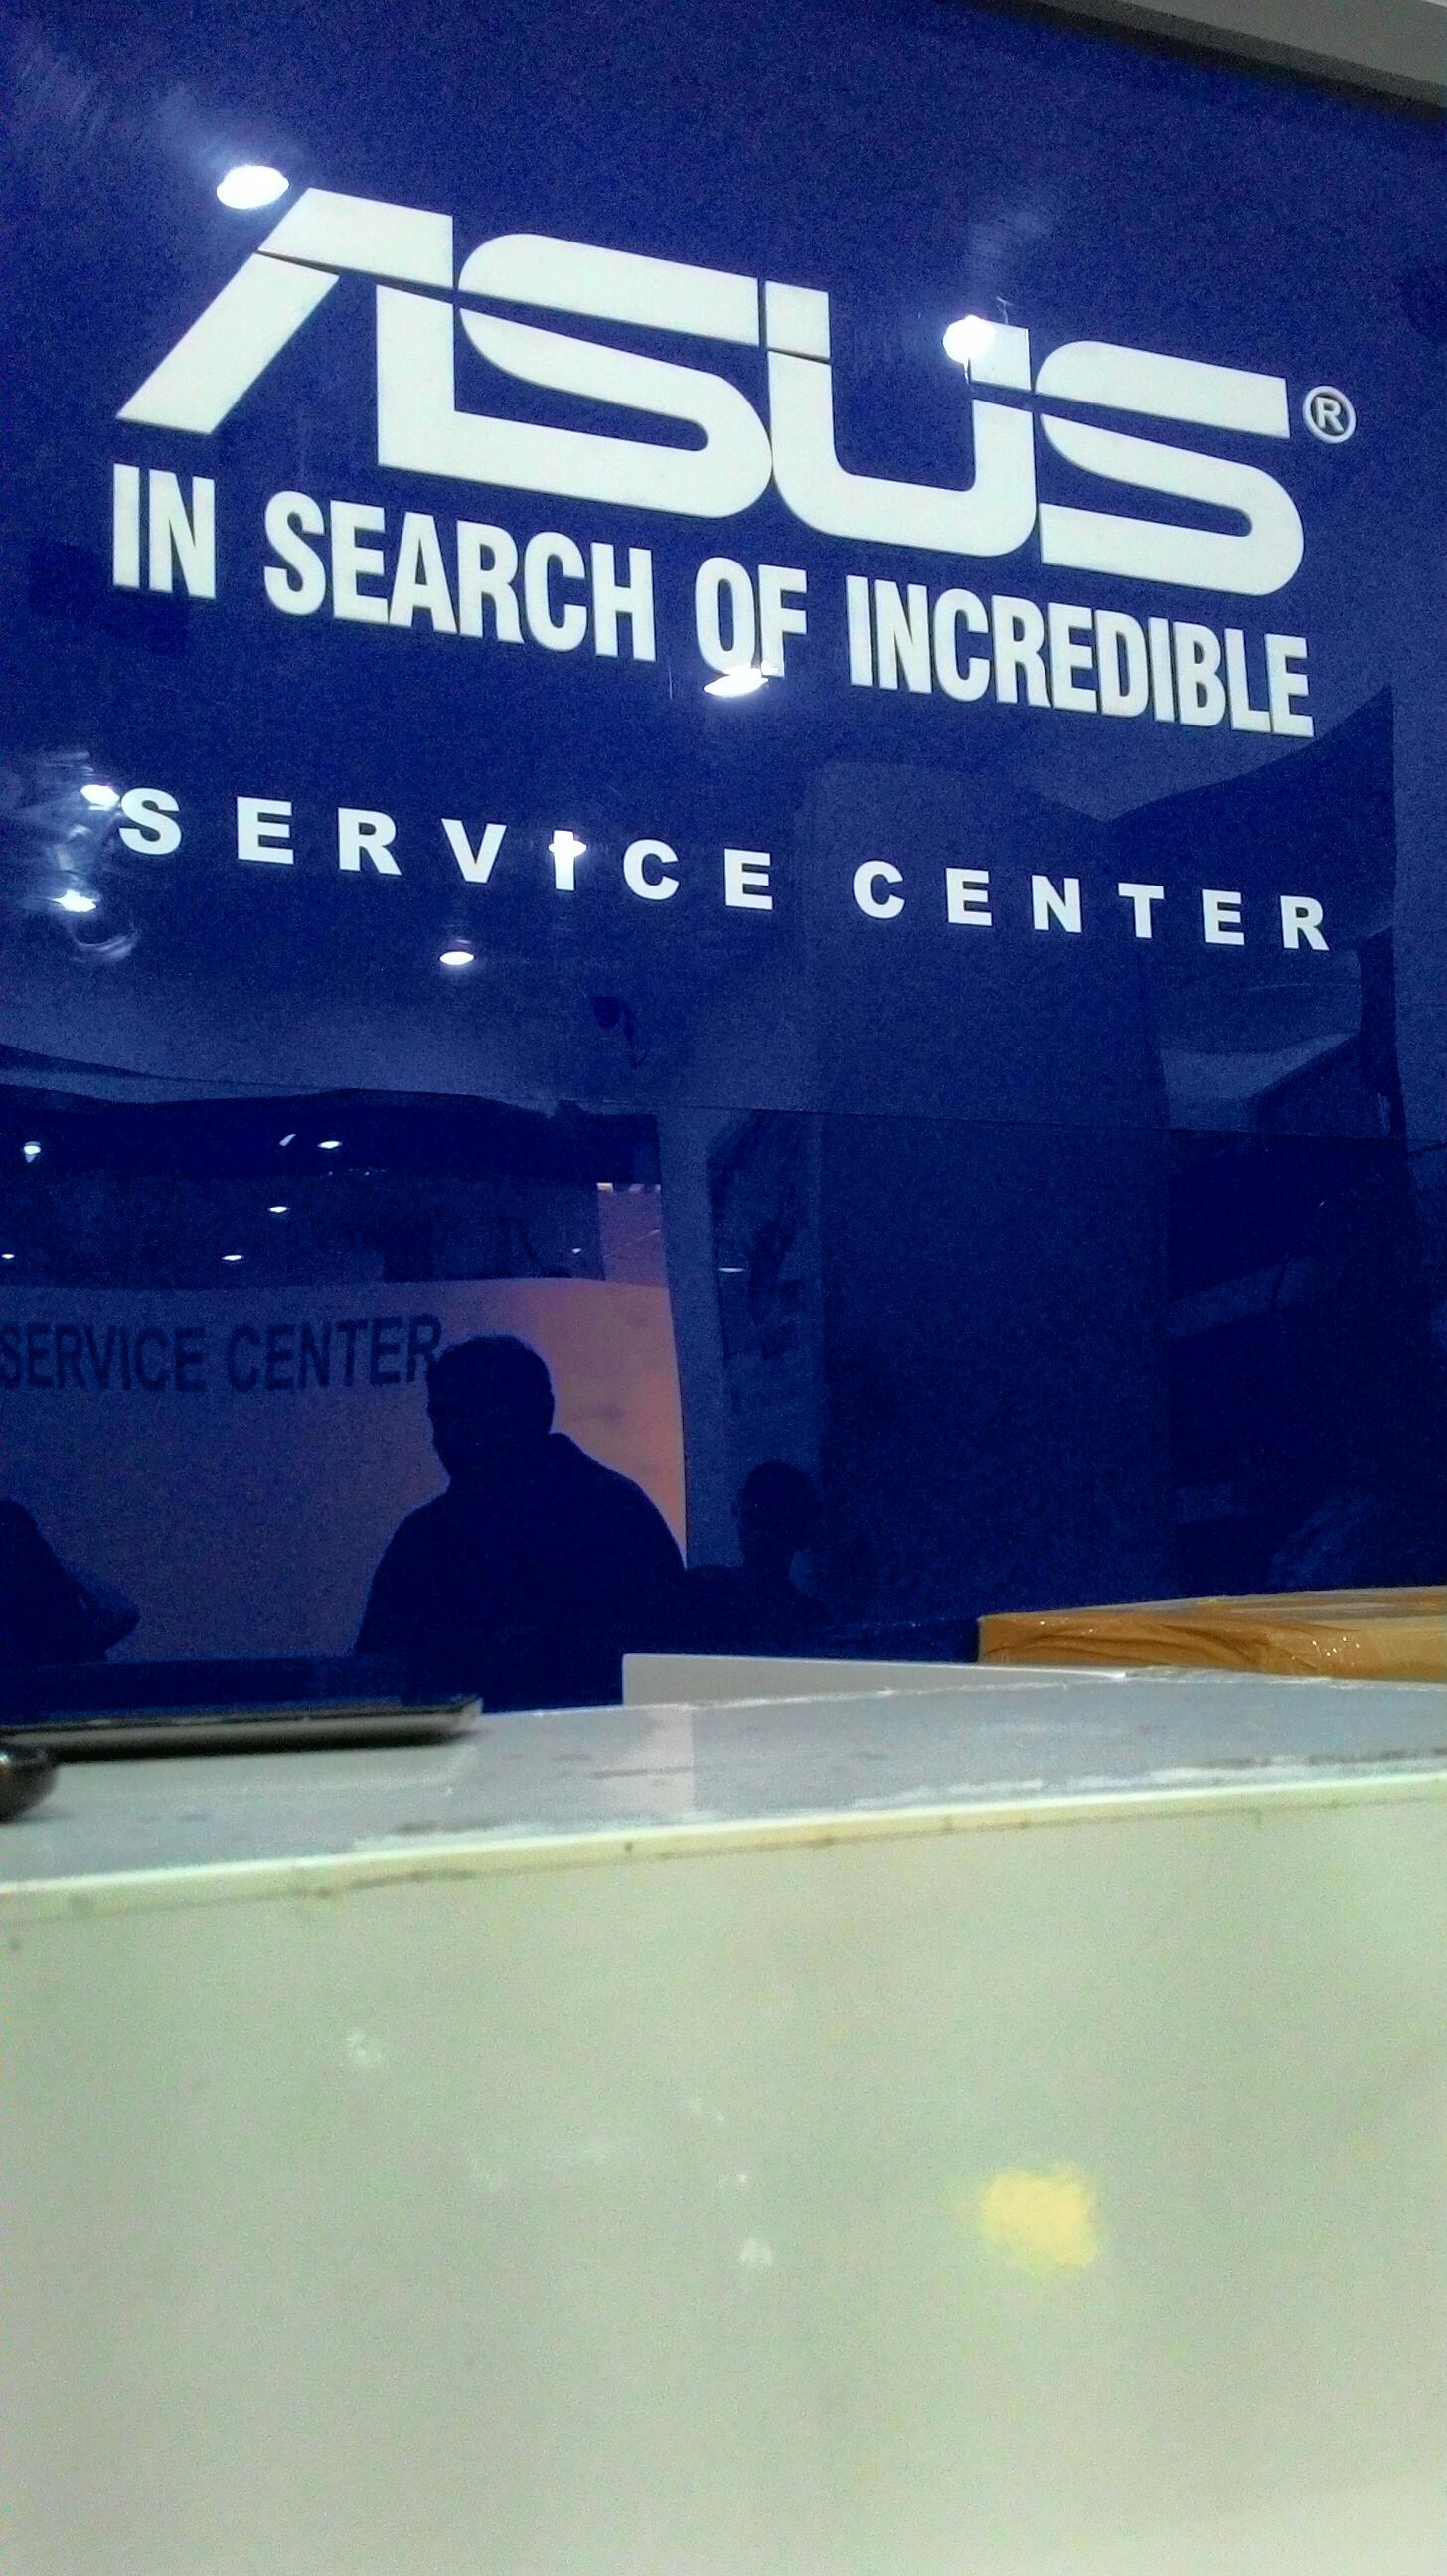 Service Center Asus Bekasi : service, center, bekasi, Seberapa, Pelayanan, Service, Center?, Aluvimoto